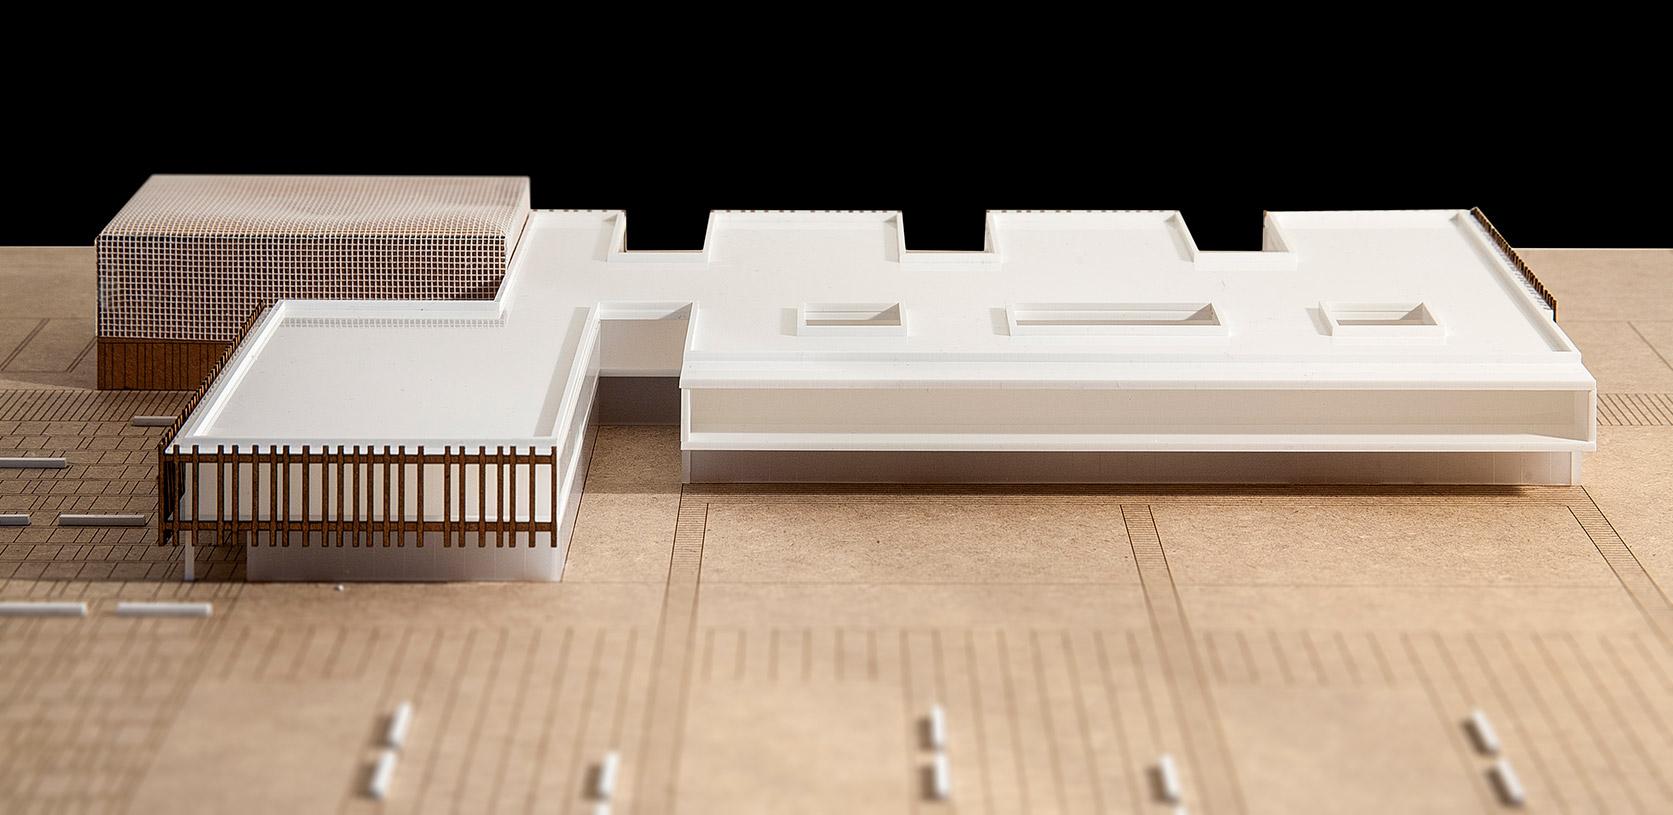 Maqueta arquitectura coworking arquiayuda ayuda pfc - Servicios de arquitectura ...